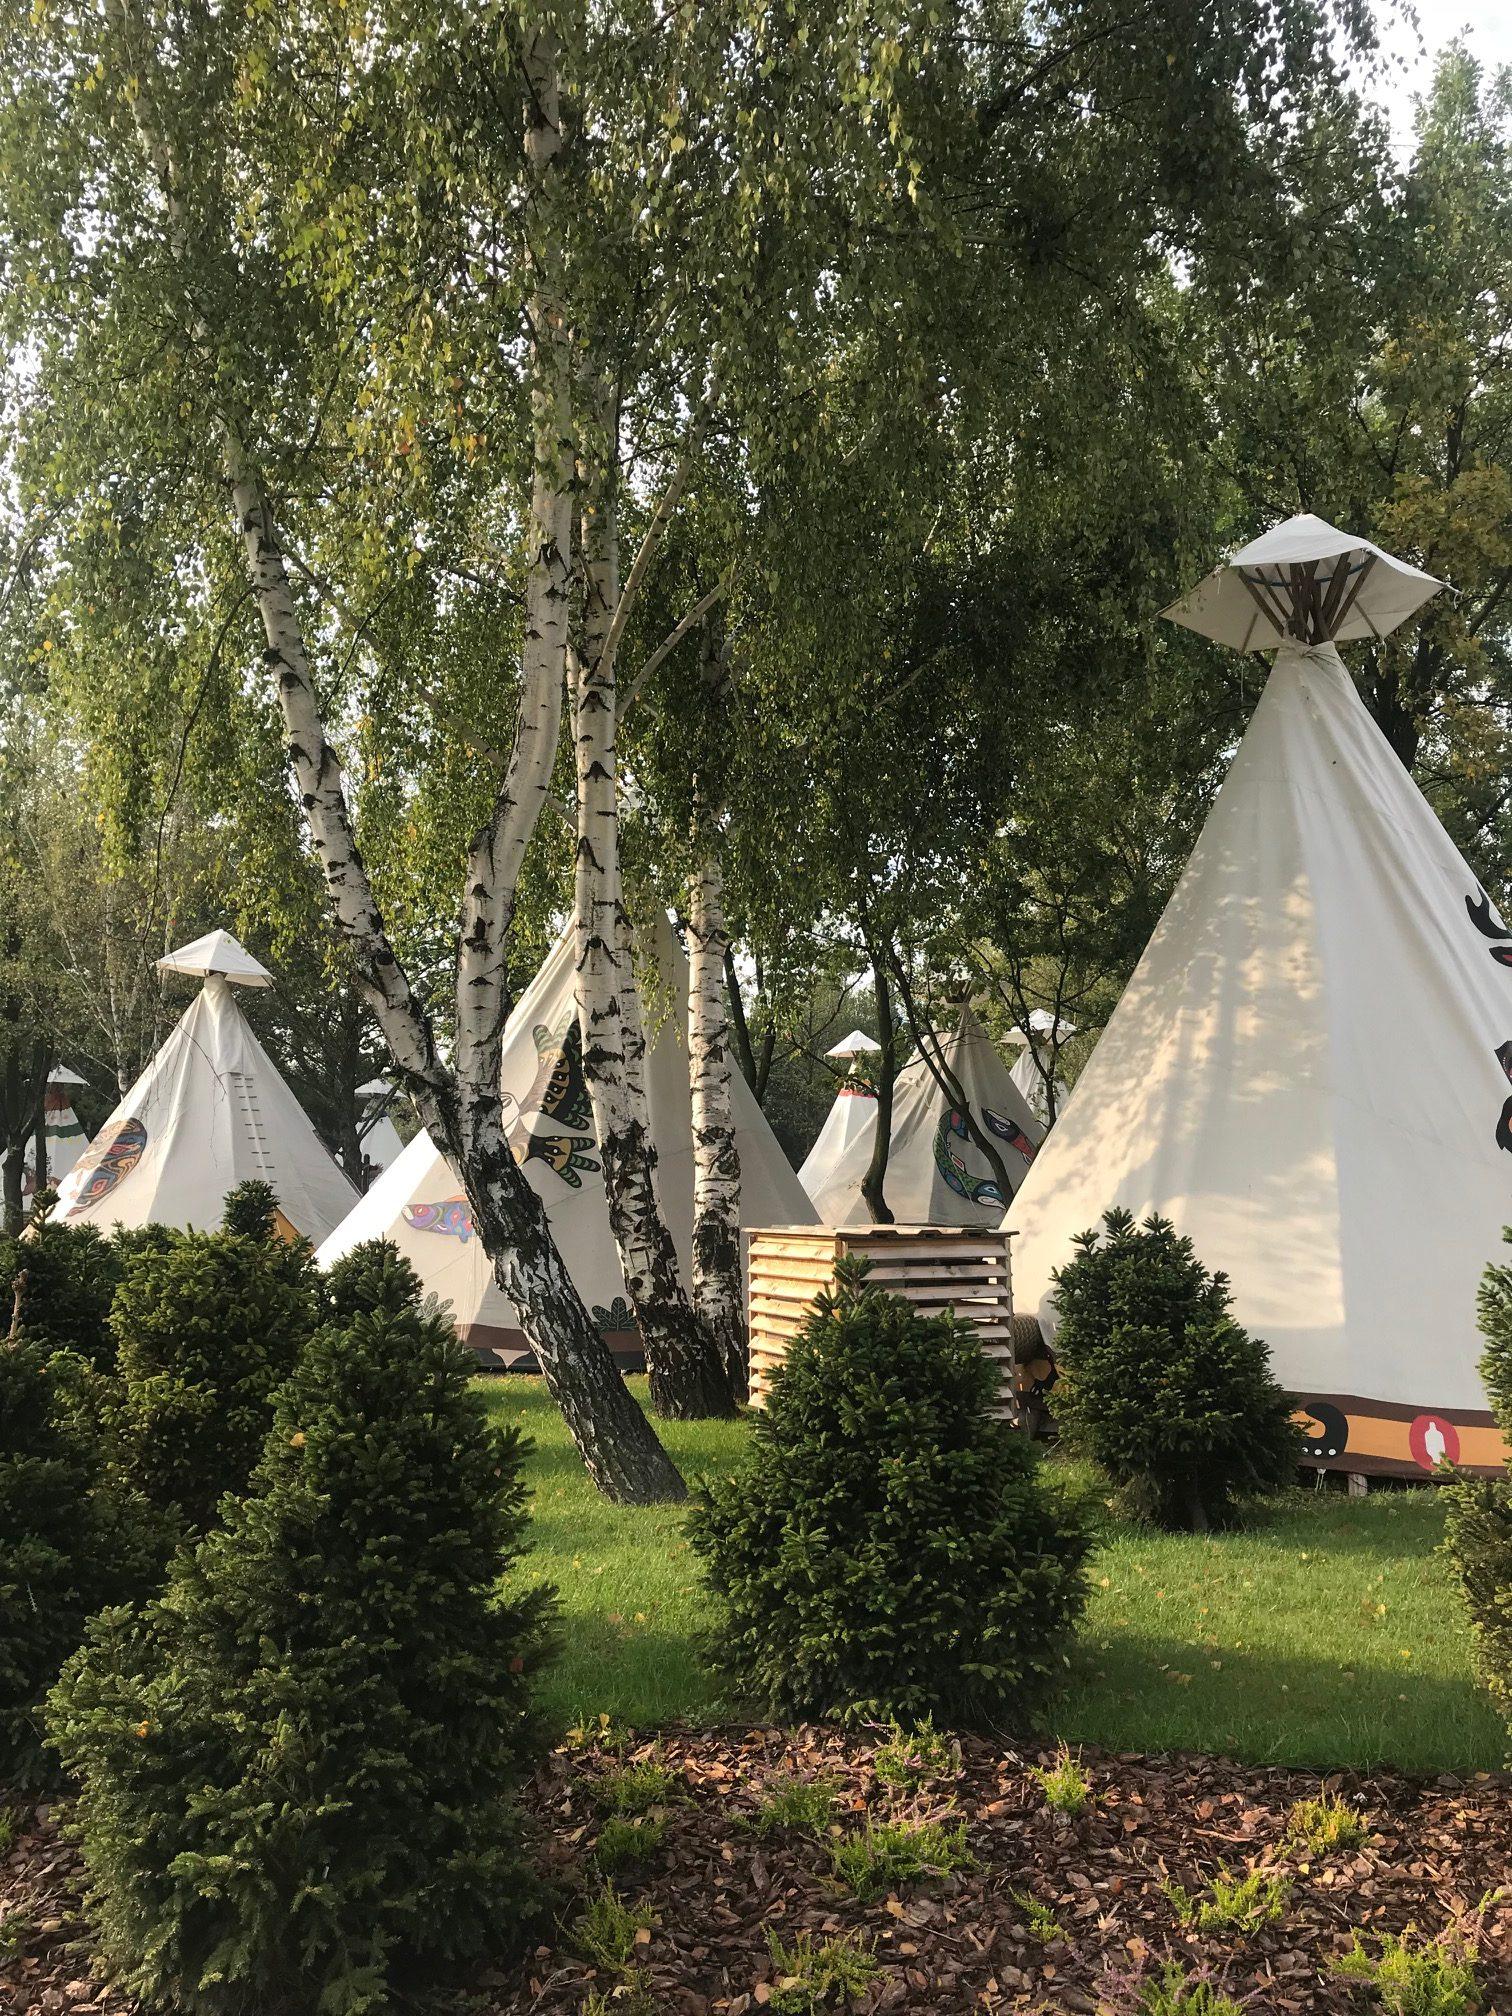 Namiot Tipi w Western Camp